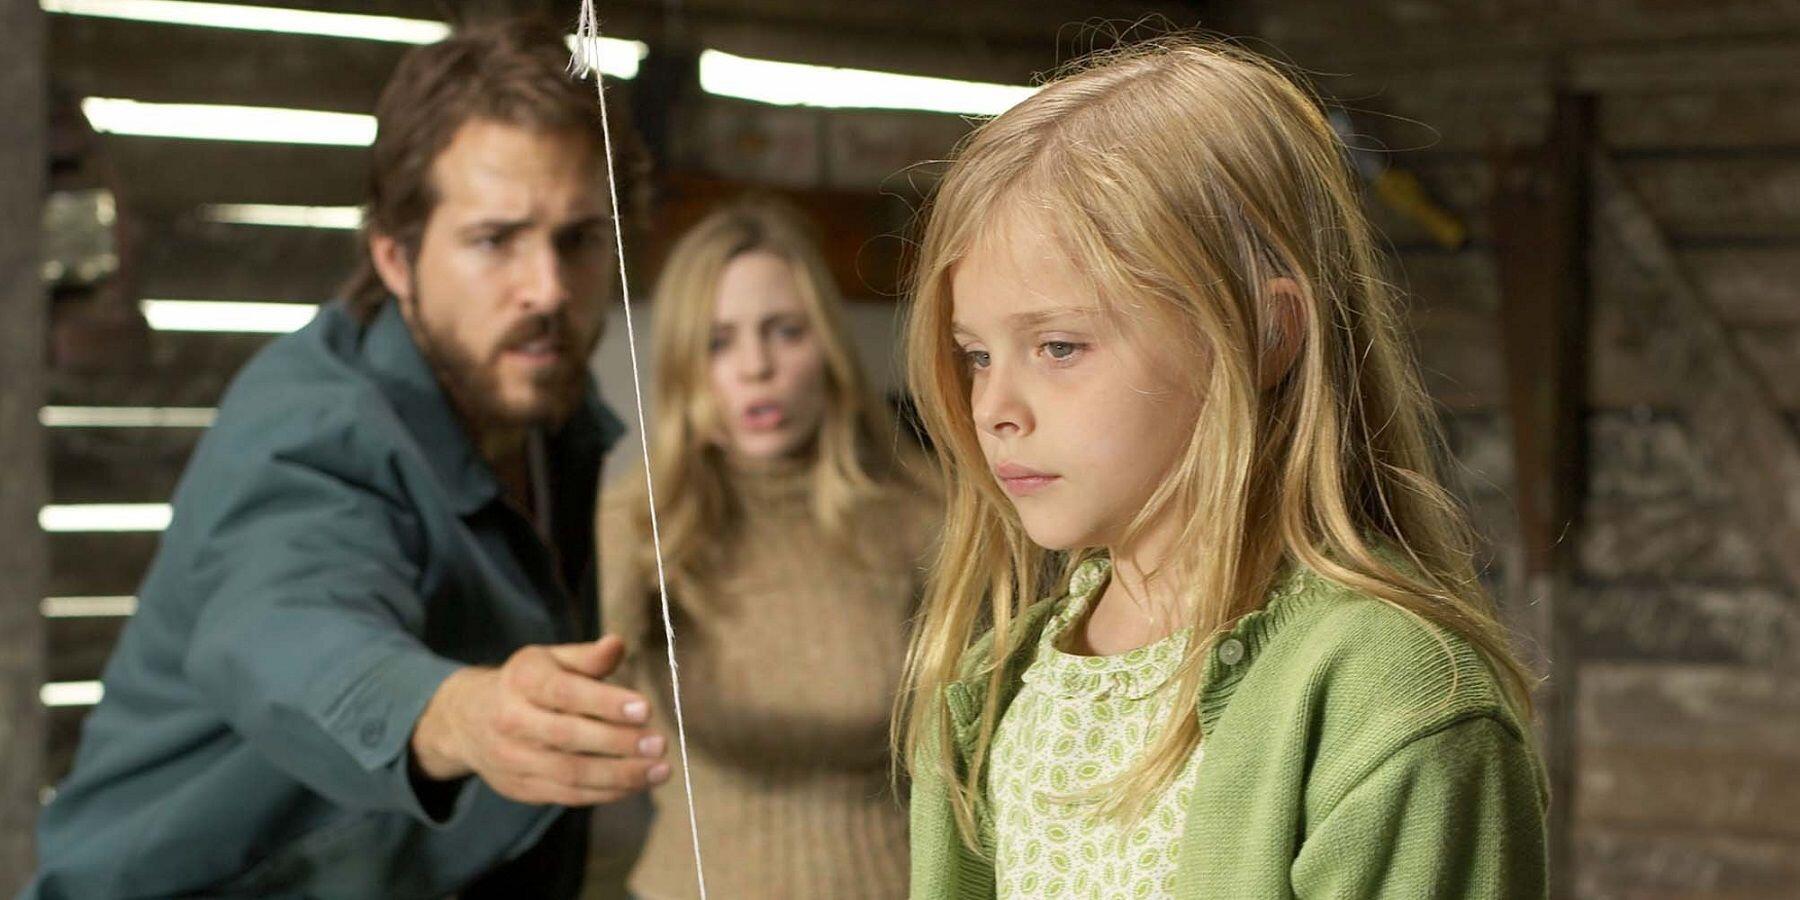 5 Film yang Bikin Kamu Kangen Chloe Grace Moretz Kecil, Masih Imut!